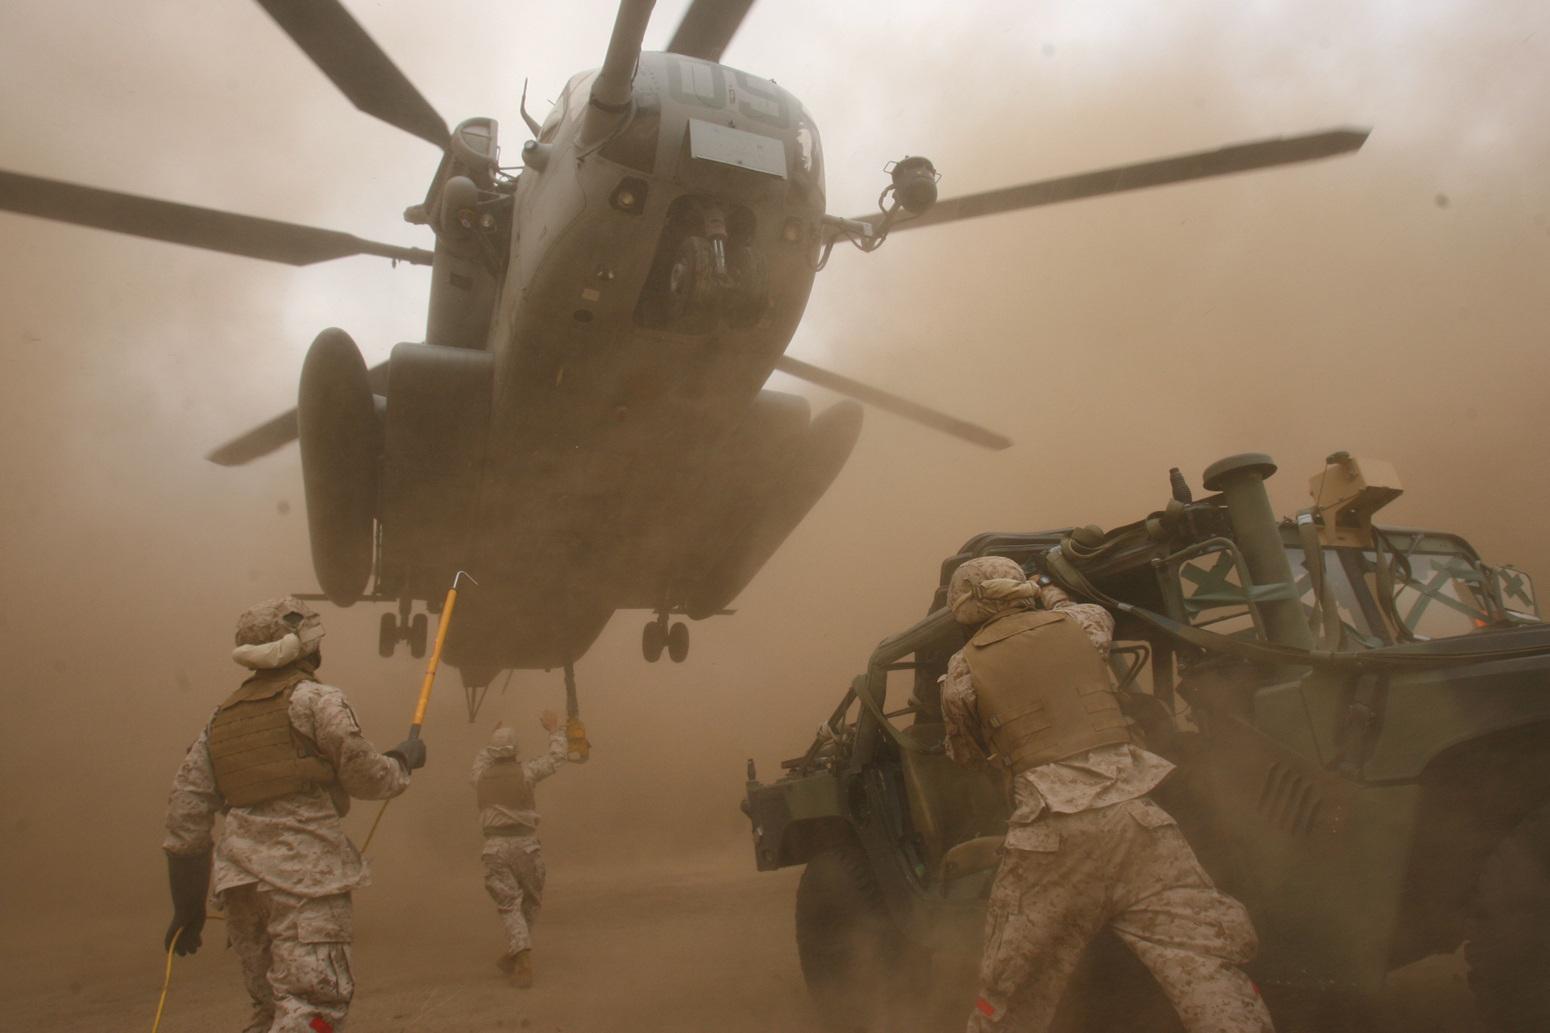 http://2.bp.blogspot.com/-Icwva8nIB9Q/UESxtruxV5I/AAAAAAAABF8/cCtZ8iKUYxg/s1600/military%252Bwallpapers%252Bhd%252B1.jpg